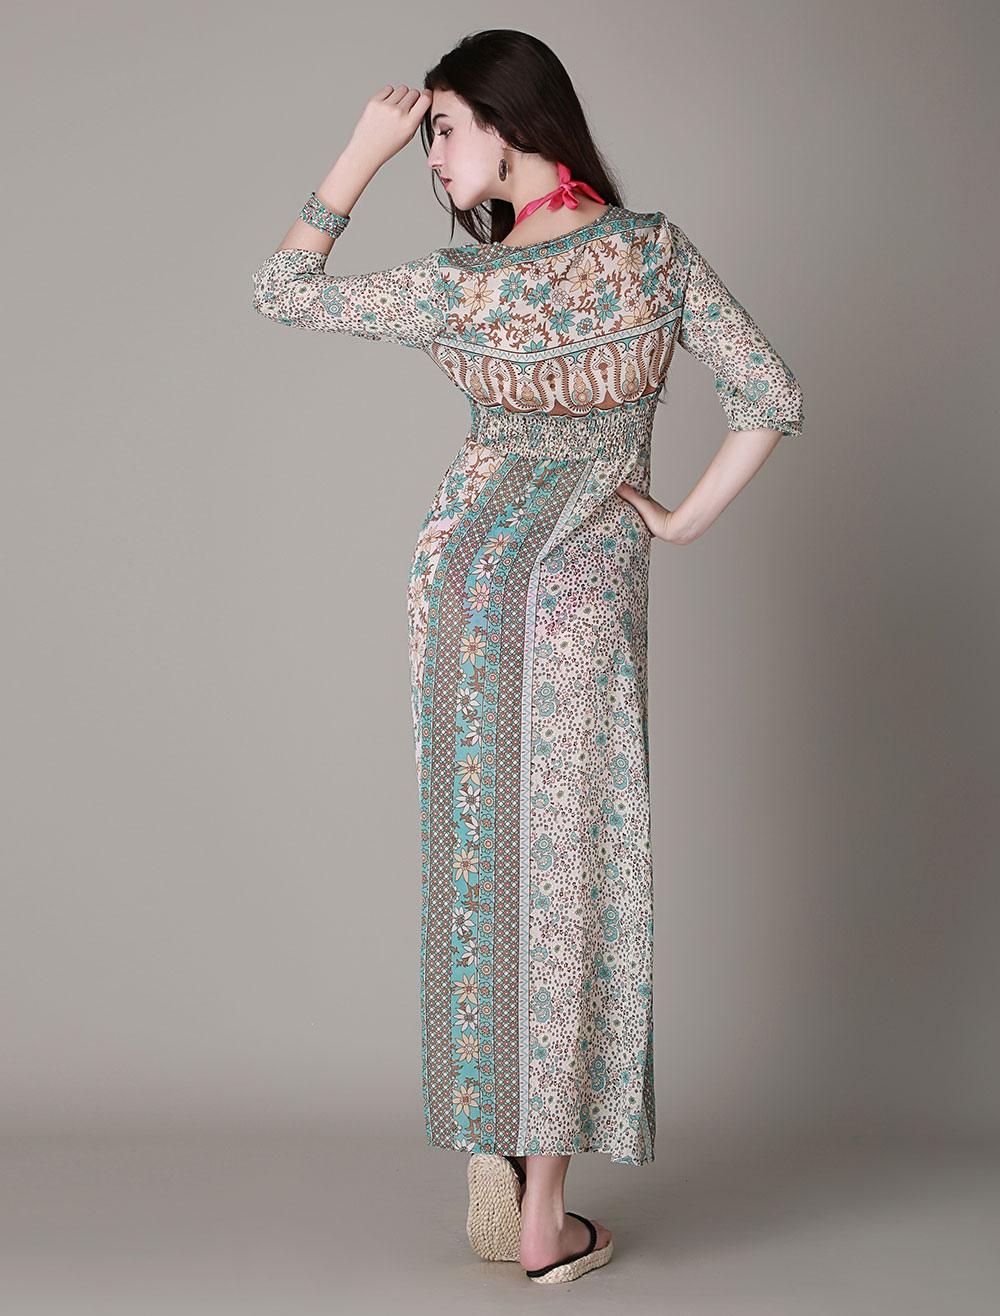 d5f3a676c628 Long Sleeve Printed High splits BOHO Maxi Dress - Milanoo.com